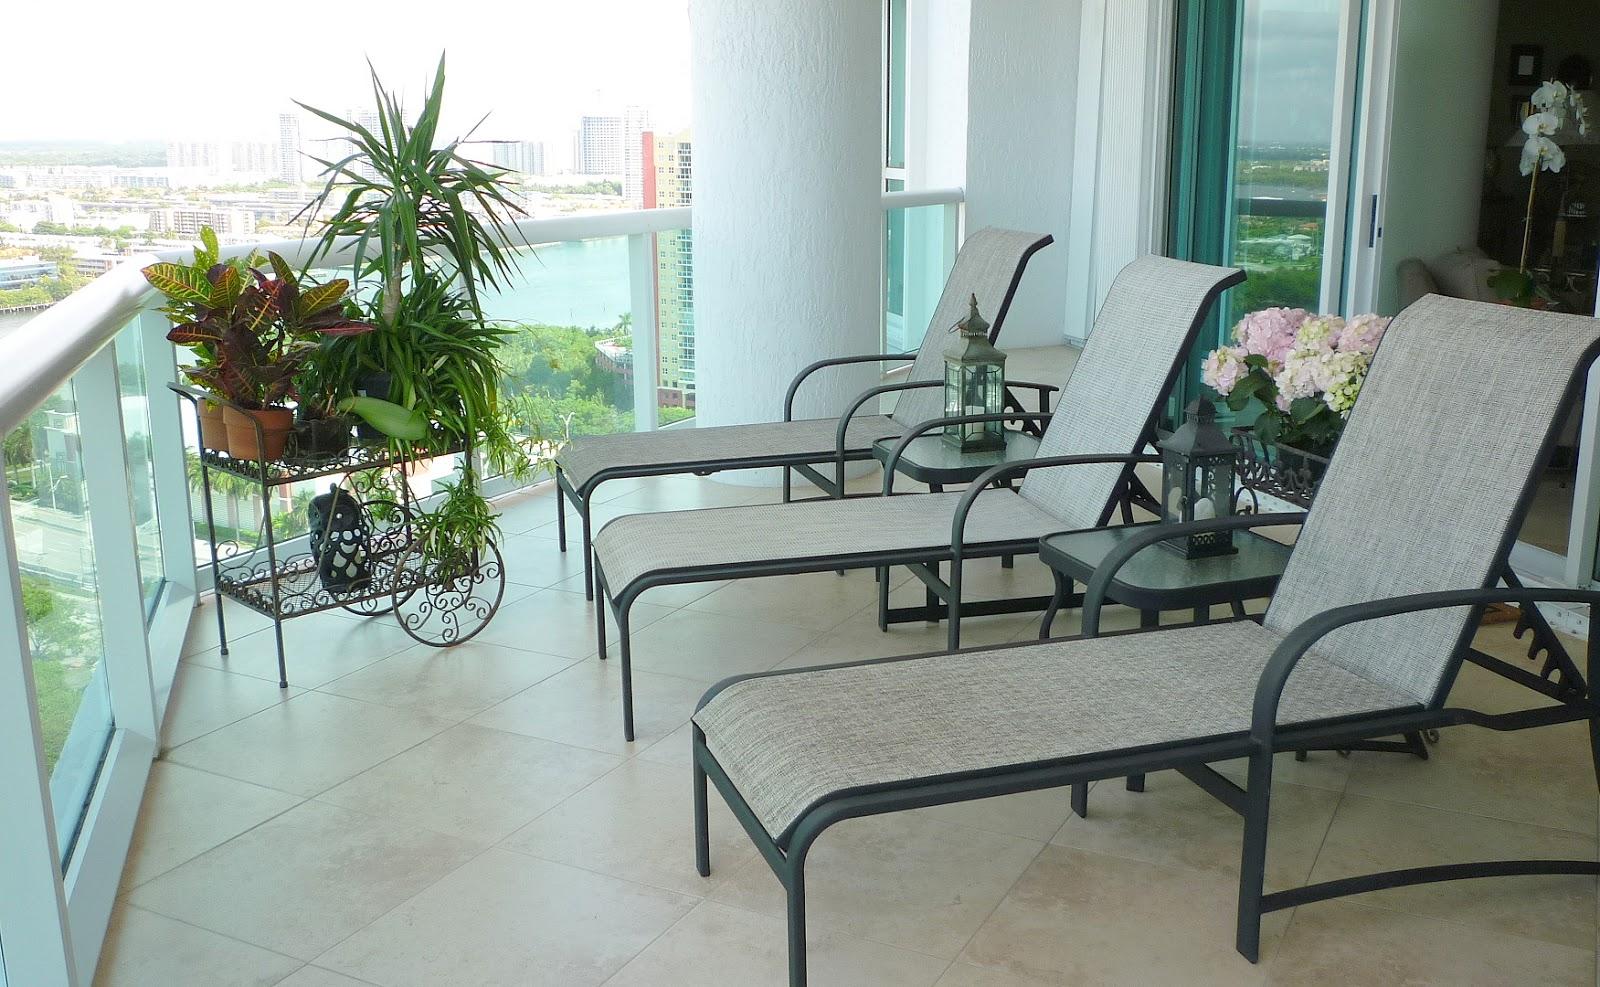 Robin Lechner Interior Designs: EXTERIOR DESIGN FOR